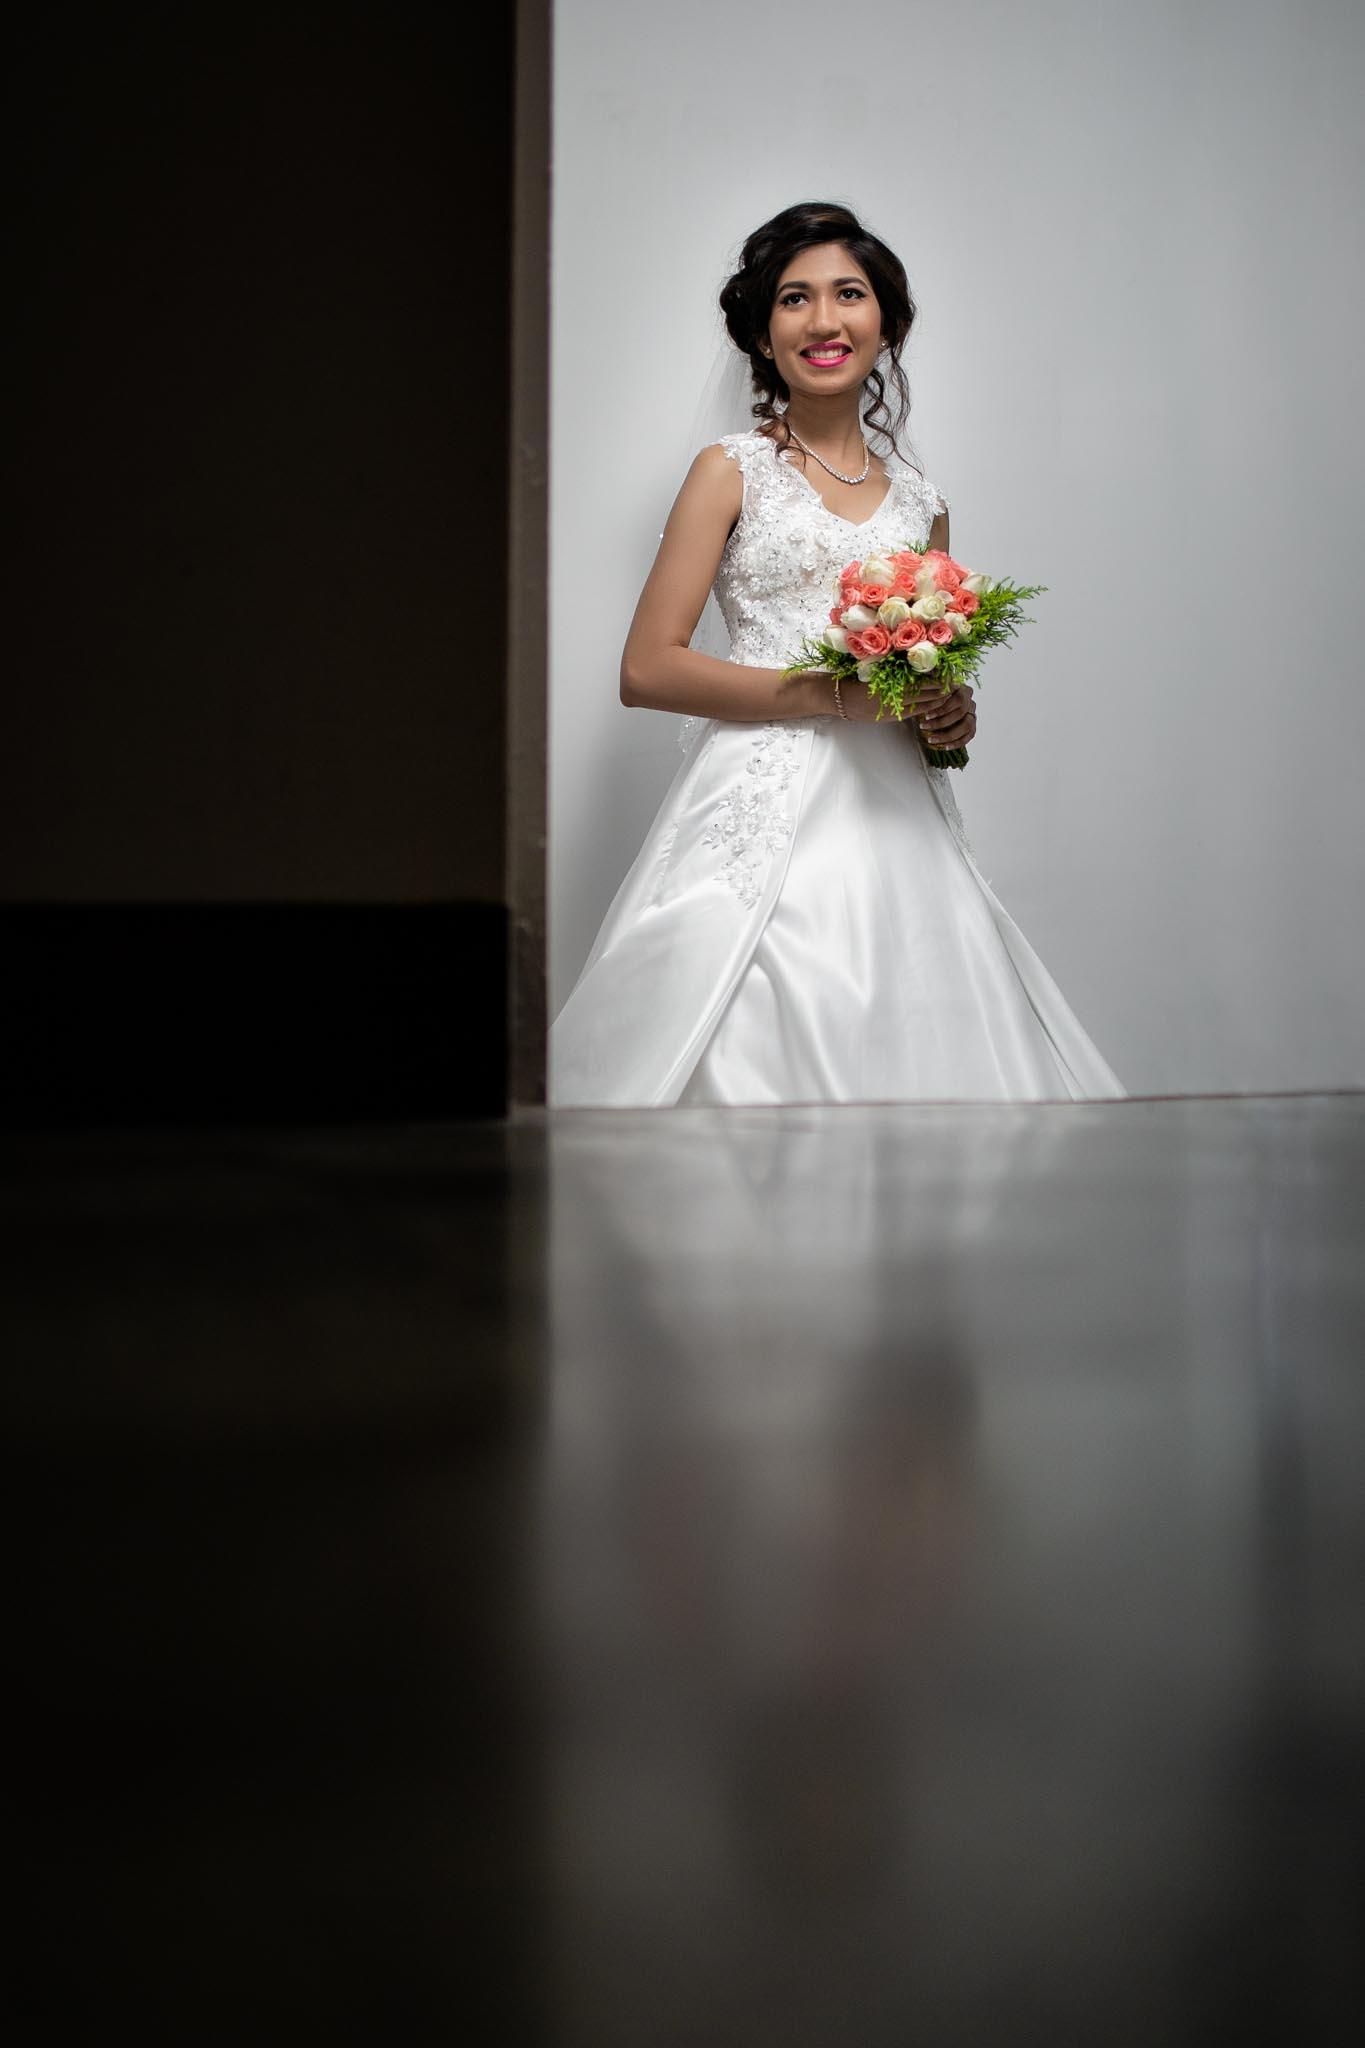 Best-of-2018-wedding-photography-focuz-studios-31